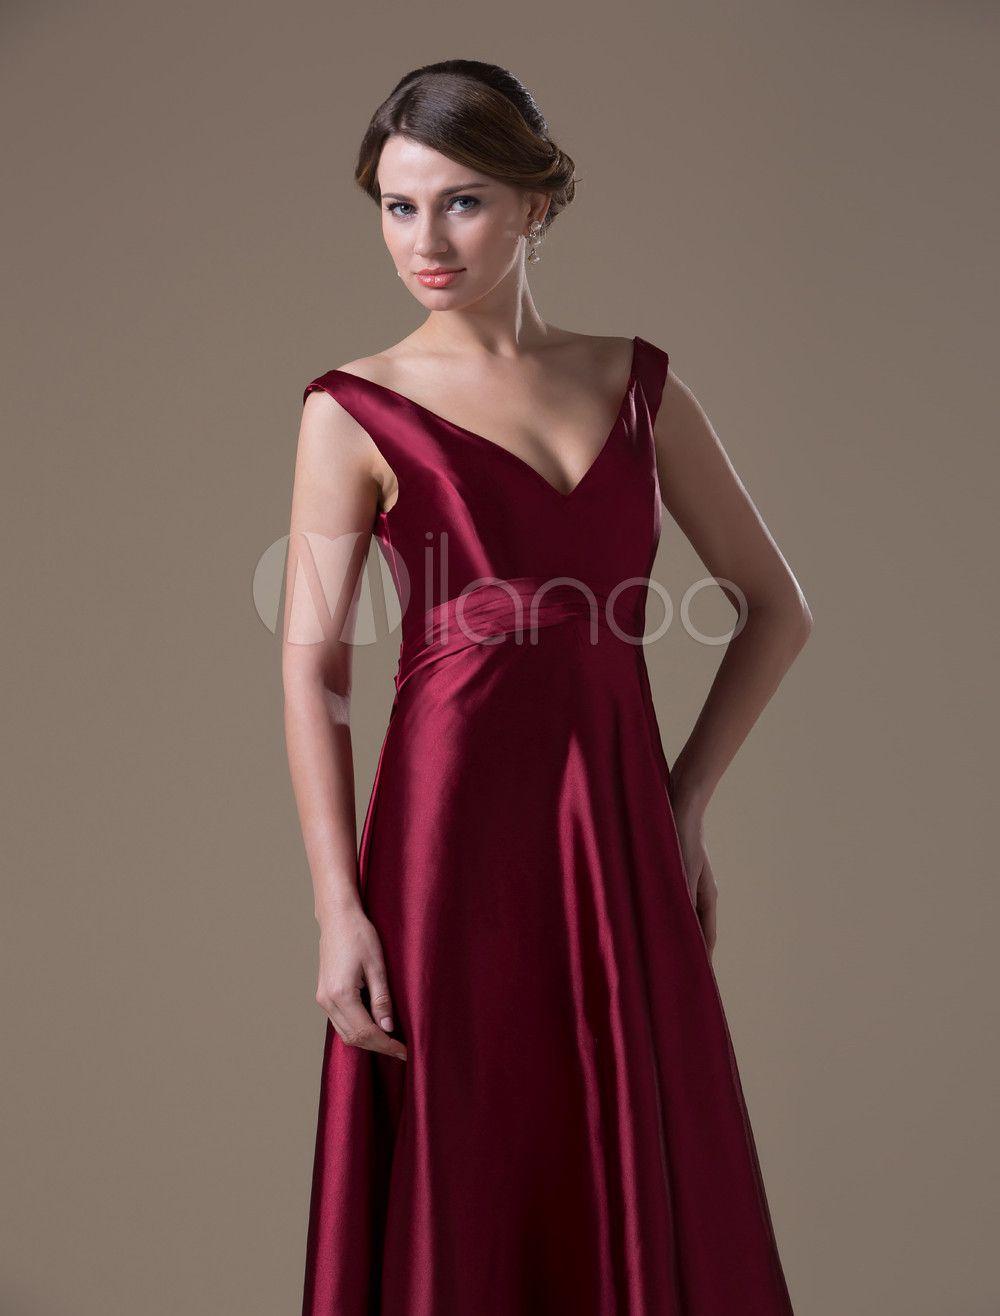 2b1846ca03c Burgundy Hot Spandex Satin Floor-length Maternity Bridesmaid Dress  Spandex